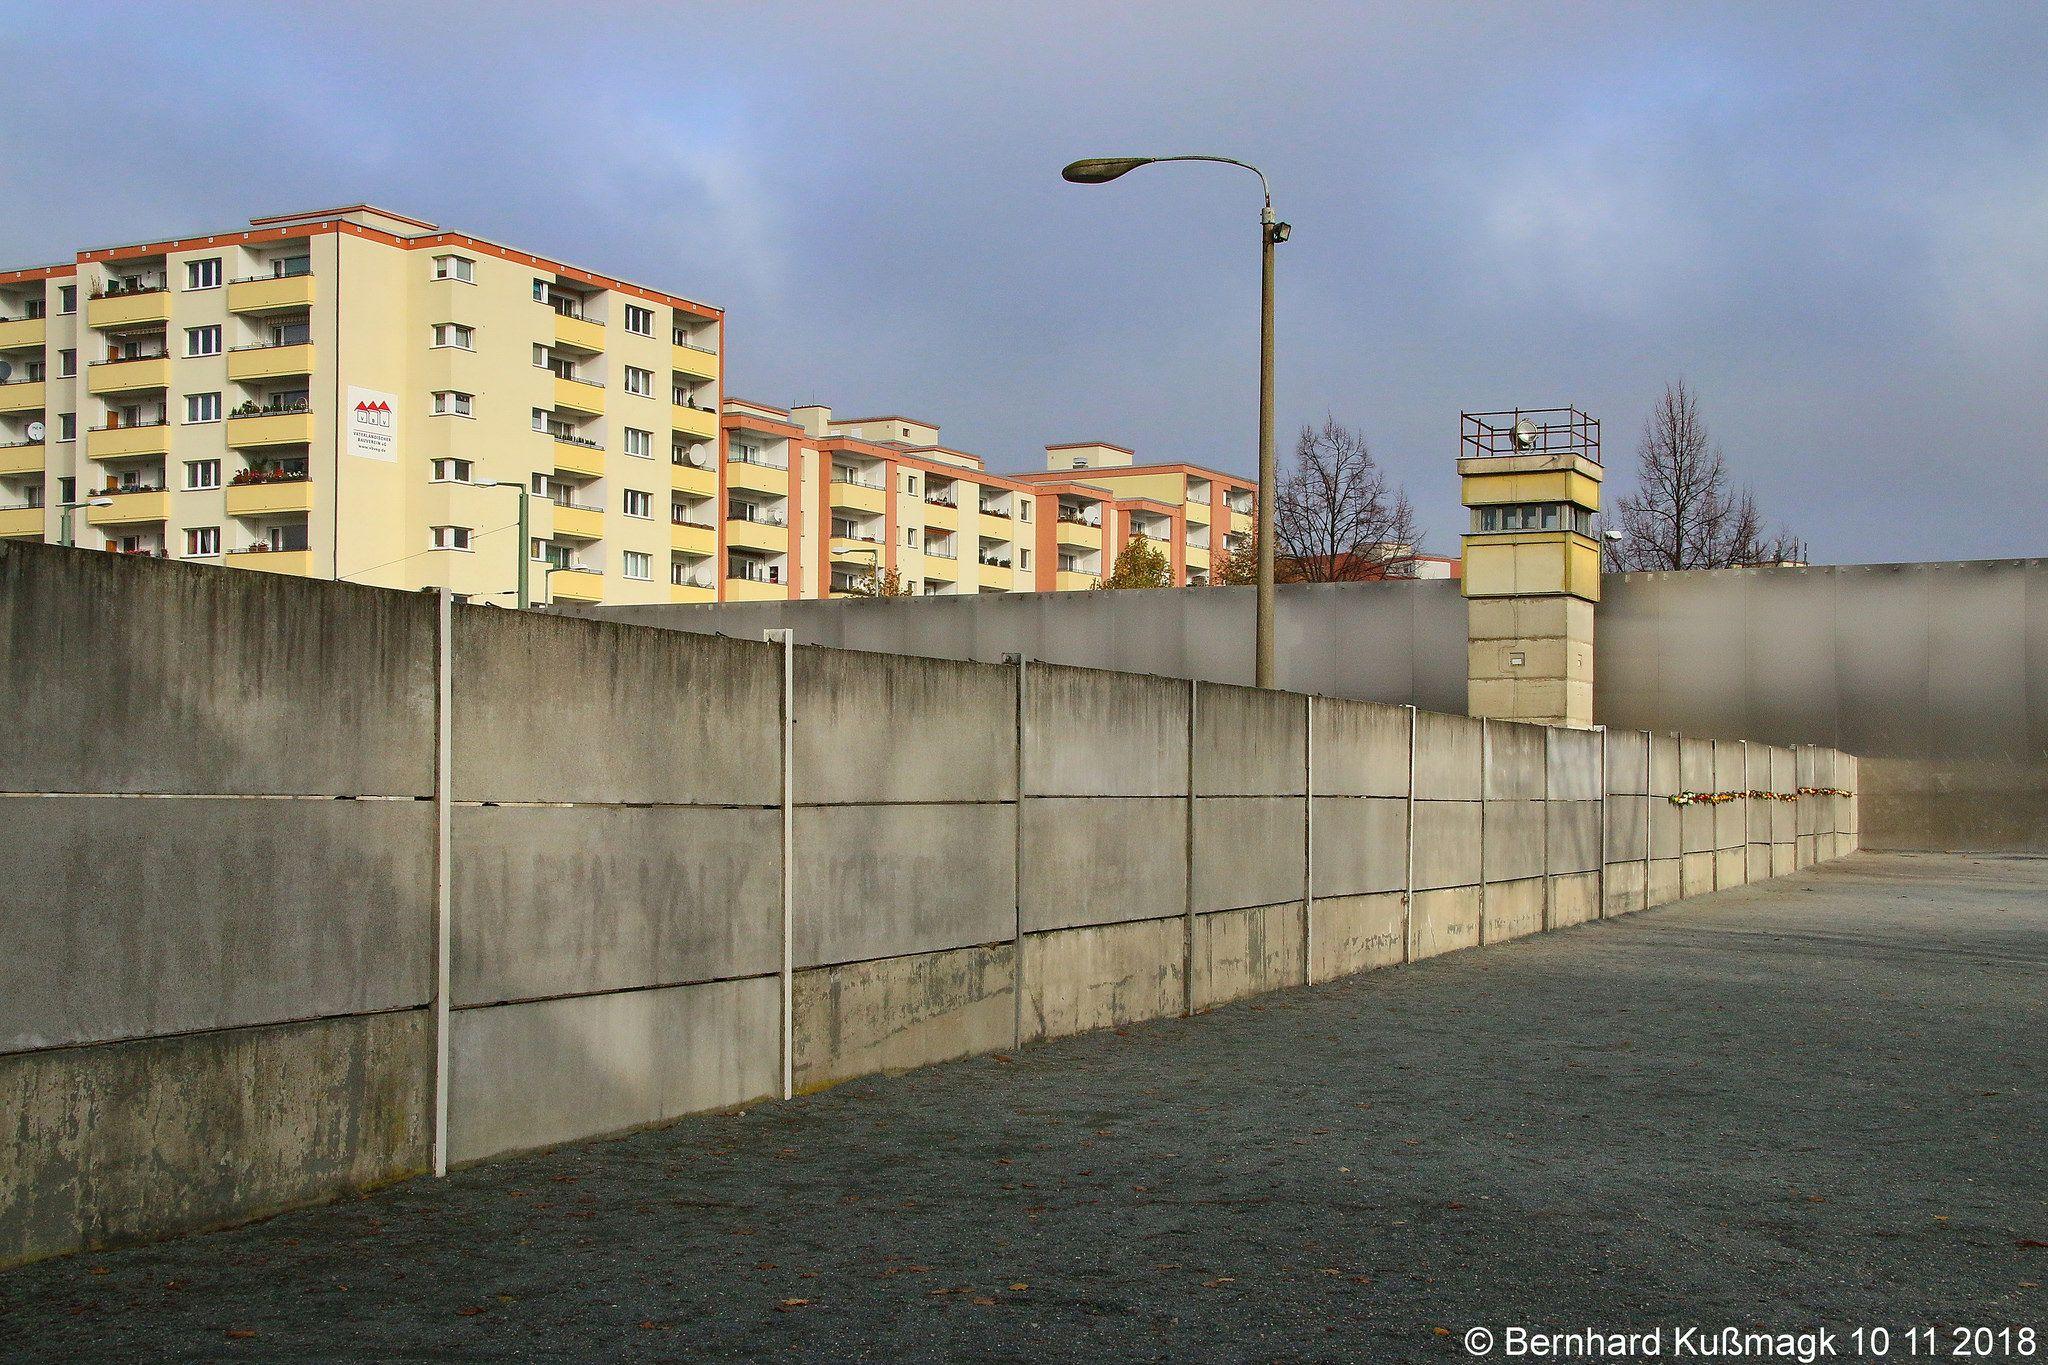 Europa Deutschland Berlin Mitte Bernauer Strasse Nahe Ecke Ackerstrasse Gedenkstatte Berliner Mauer Berlin Wall West Berlin Berlin